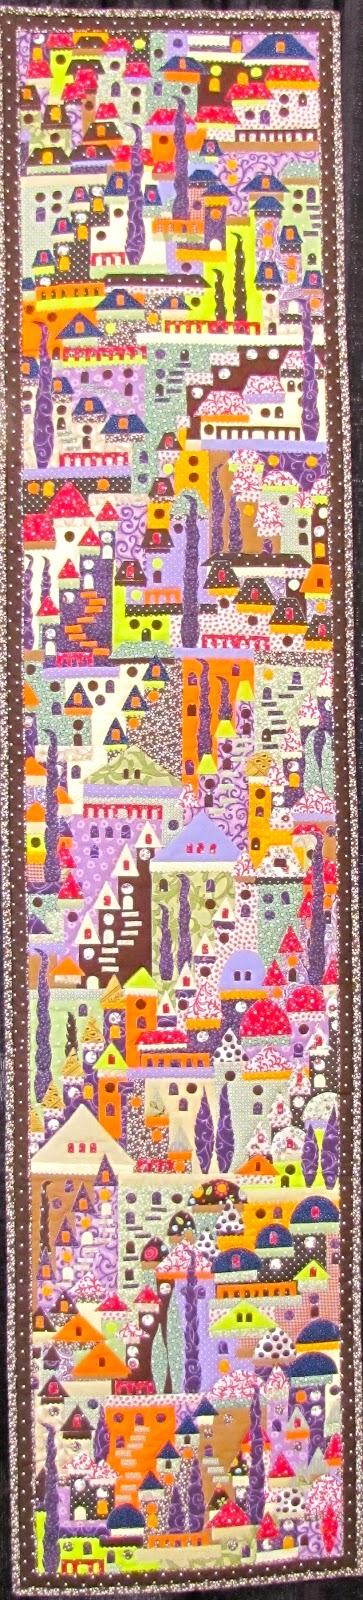 Canton Village Quilt Works | The Quilt Parade : village quilt - Adamdwight.com